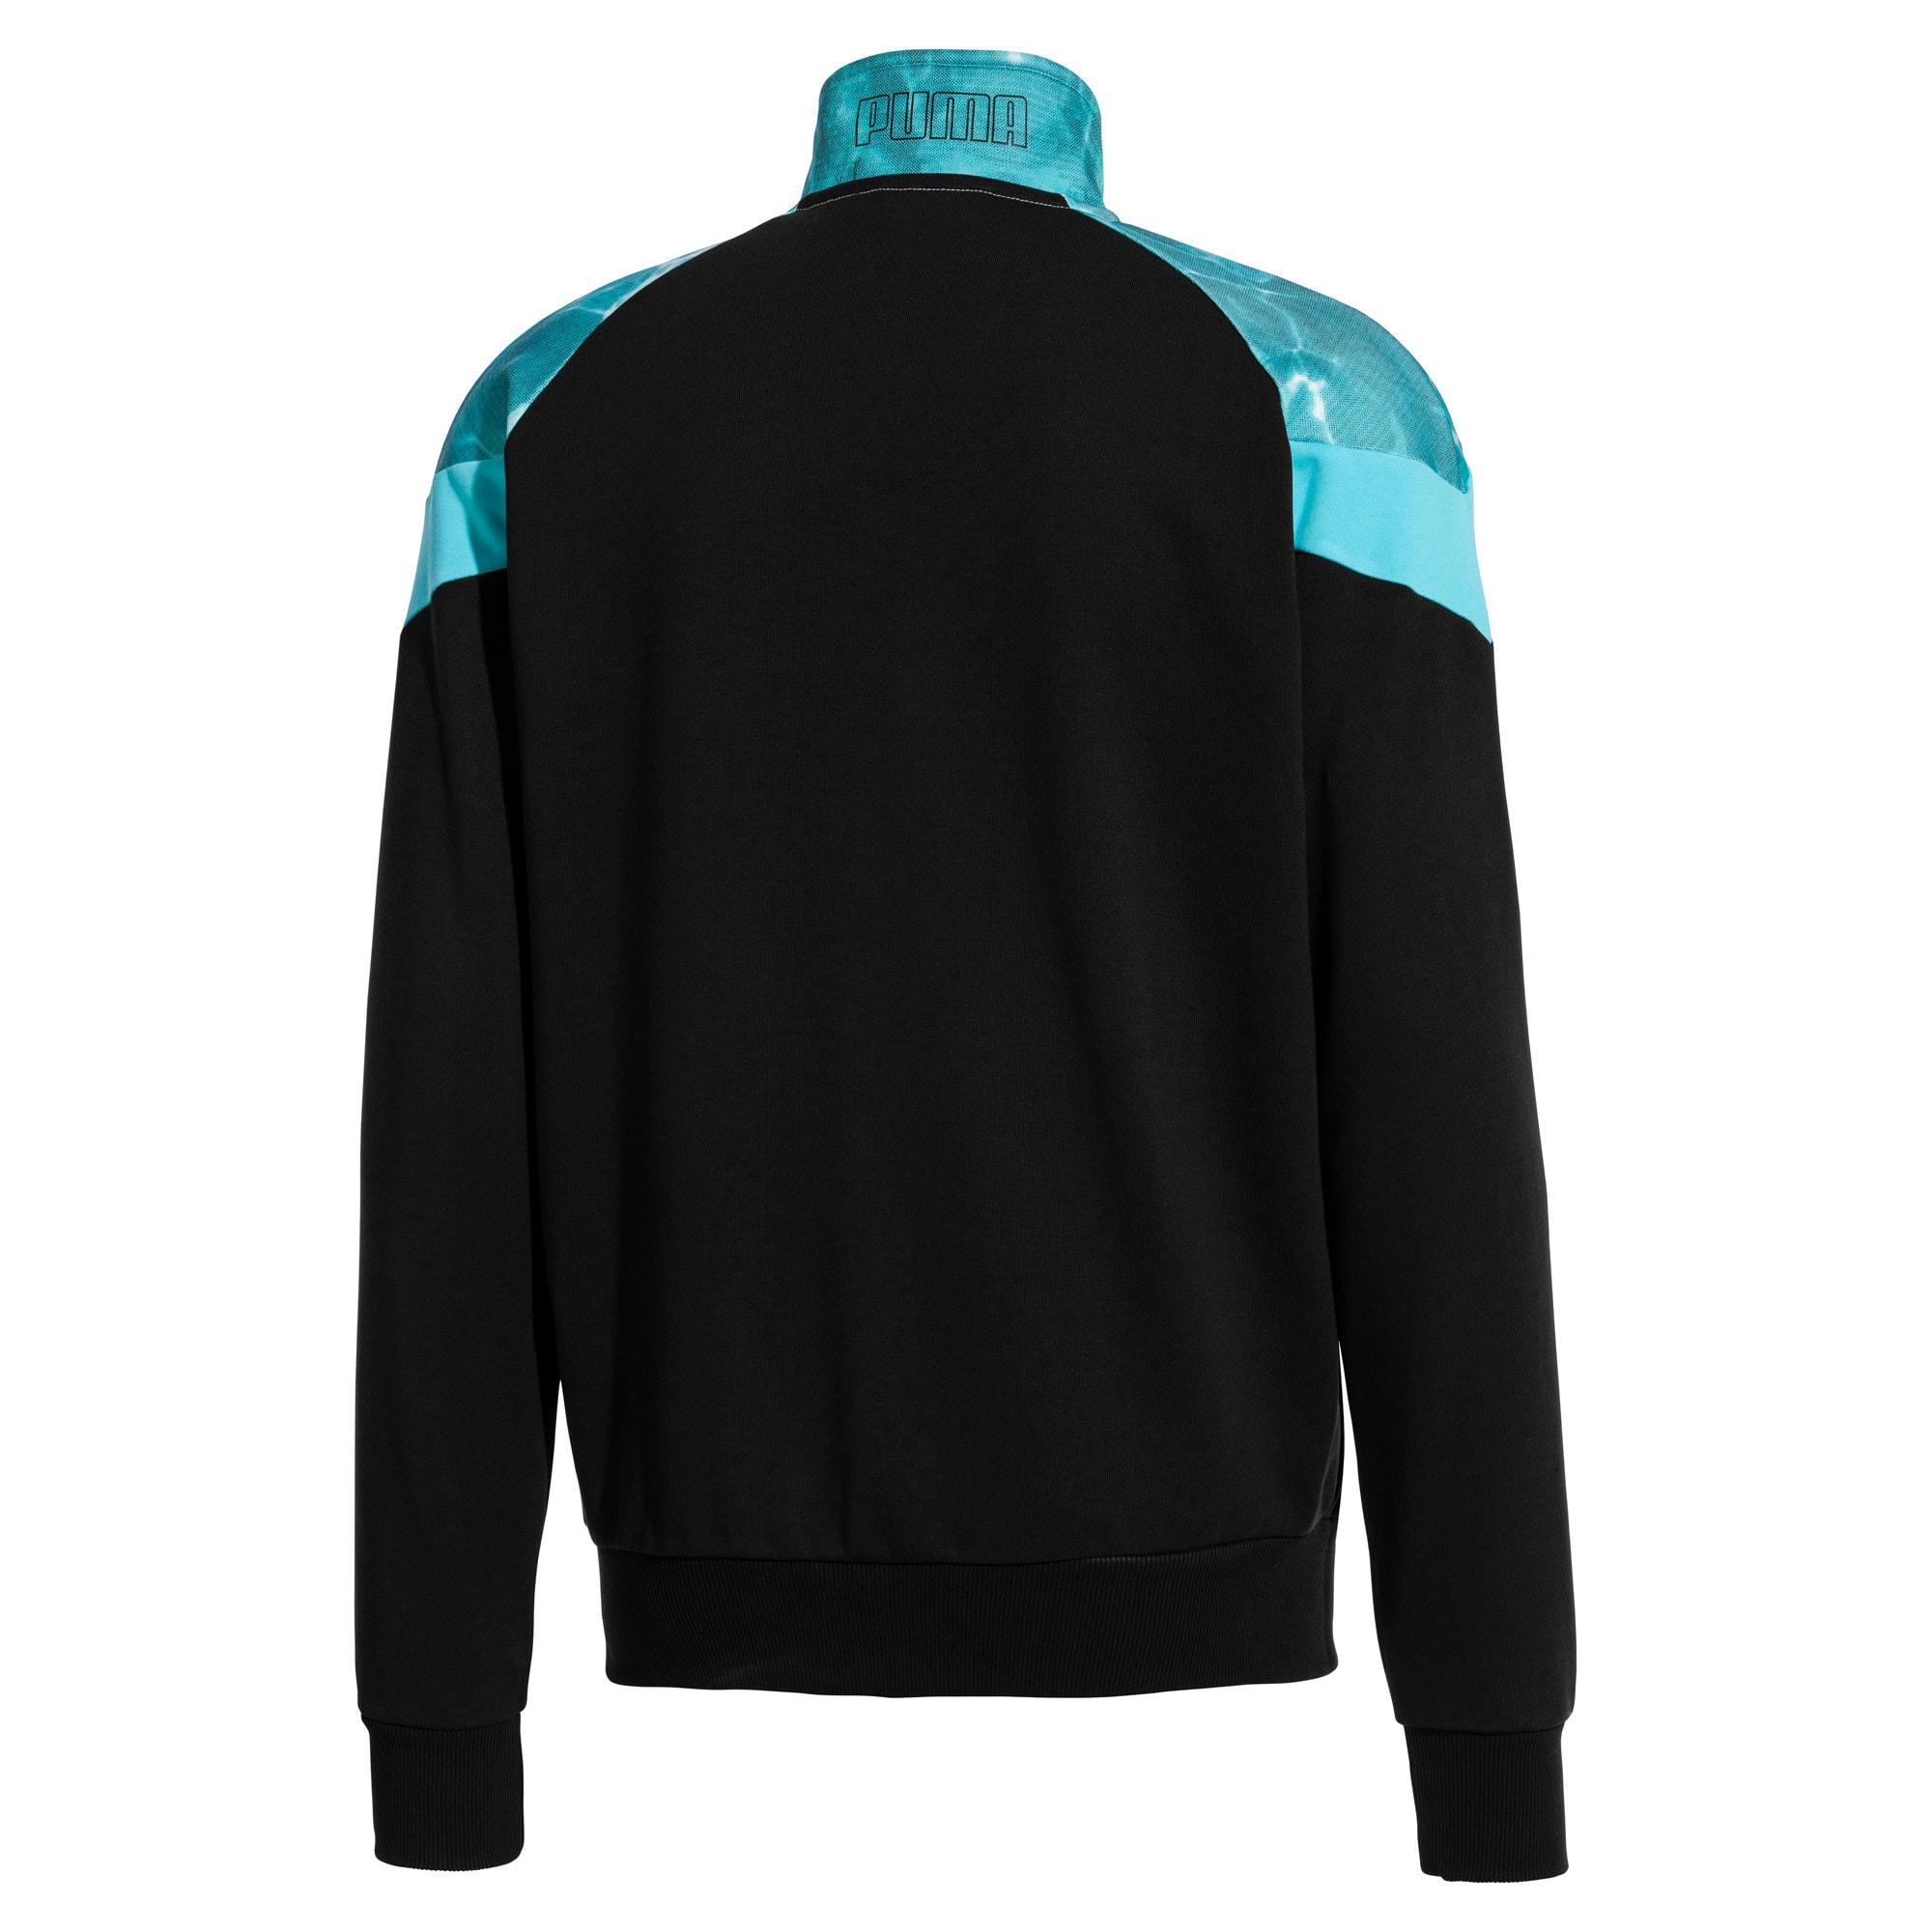 Thumbnail 3 of MCS Pool Men's Track Jacket, Puma Black, medium